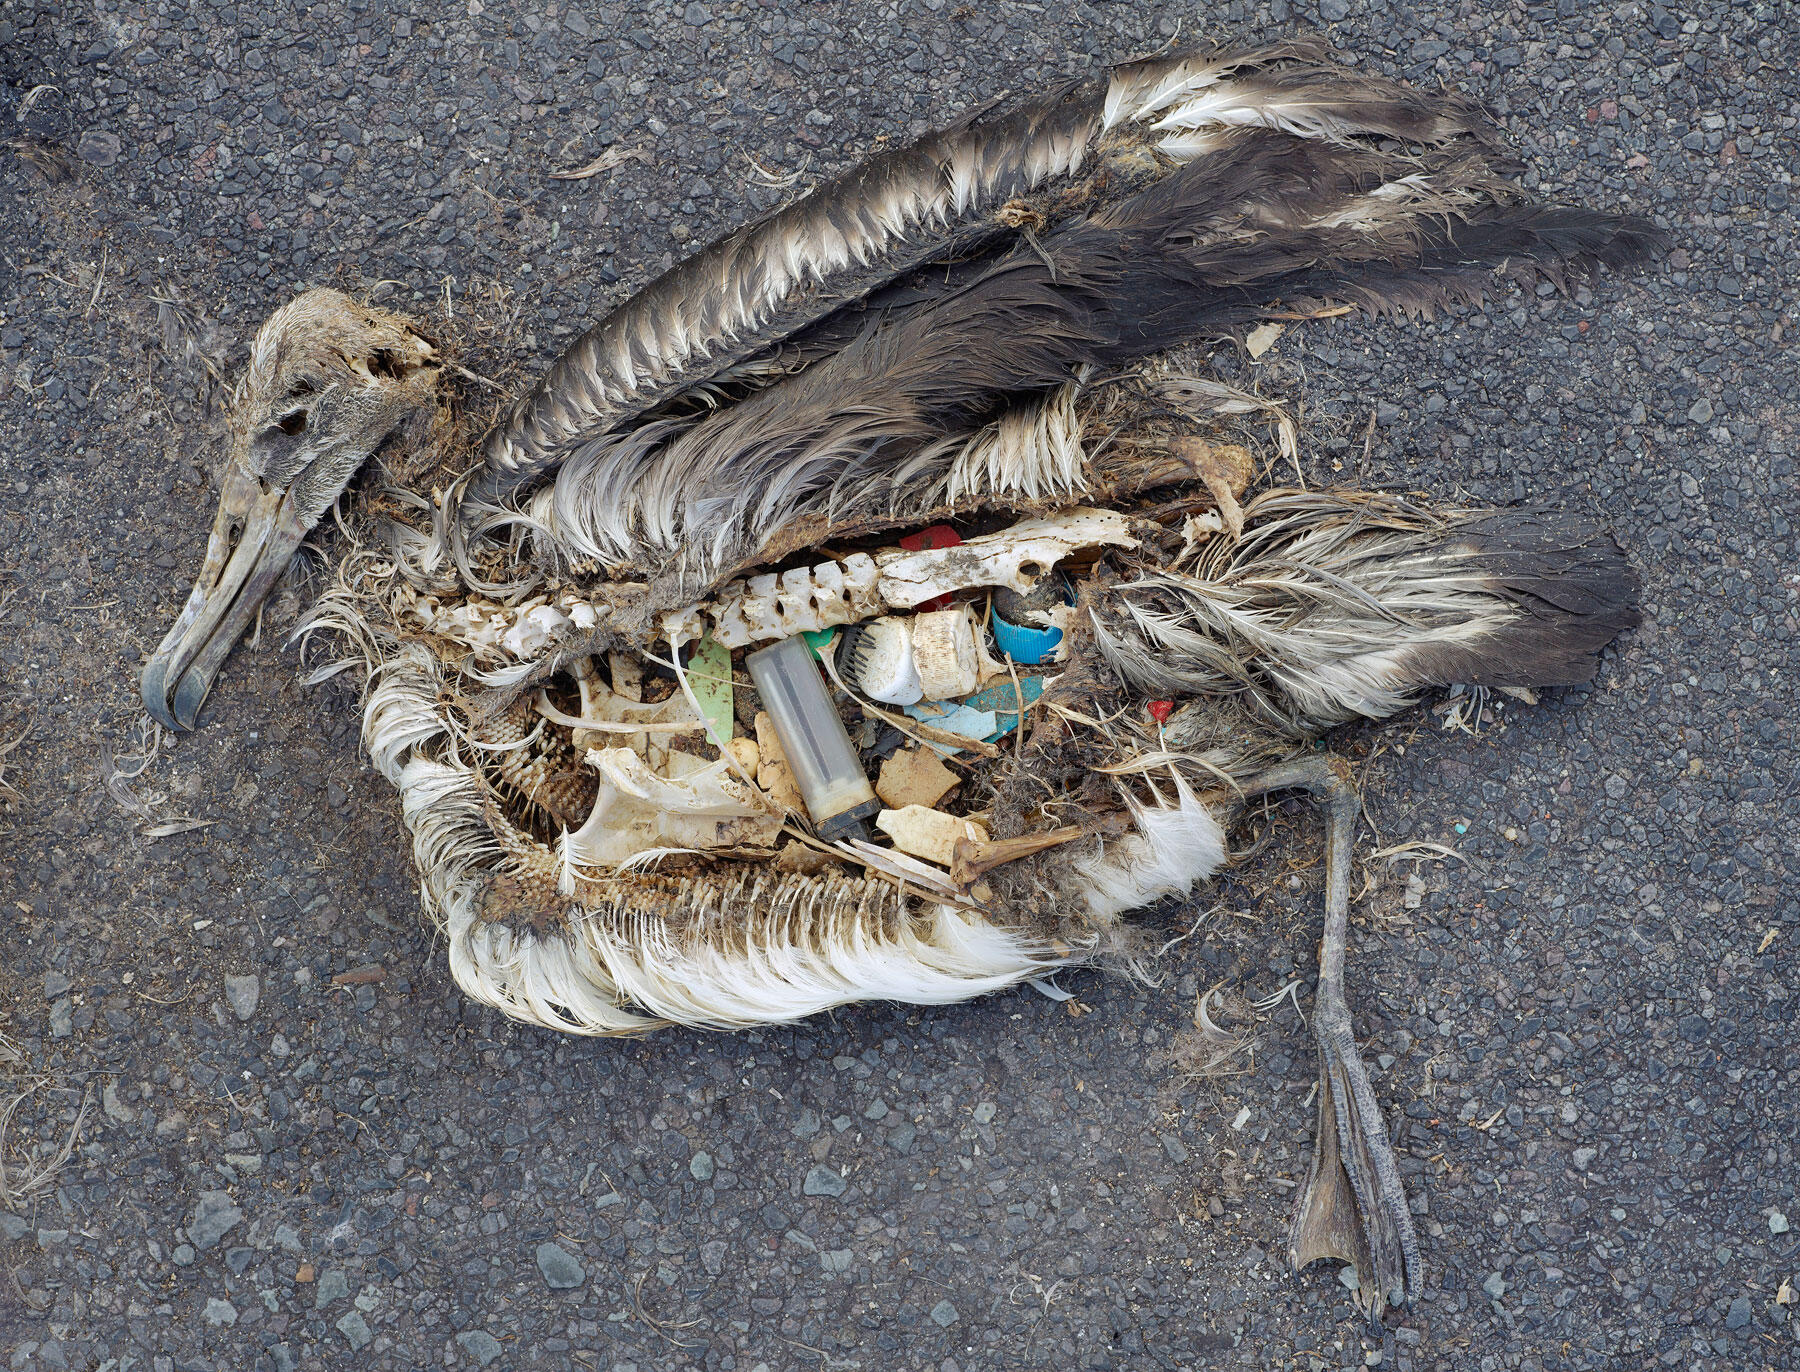 Laysan Albatross. Chris Jordan